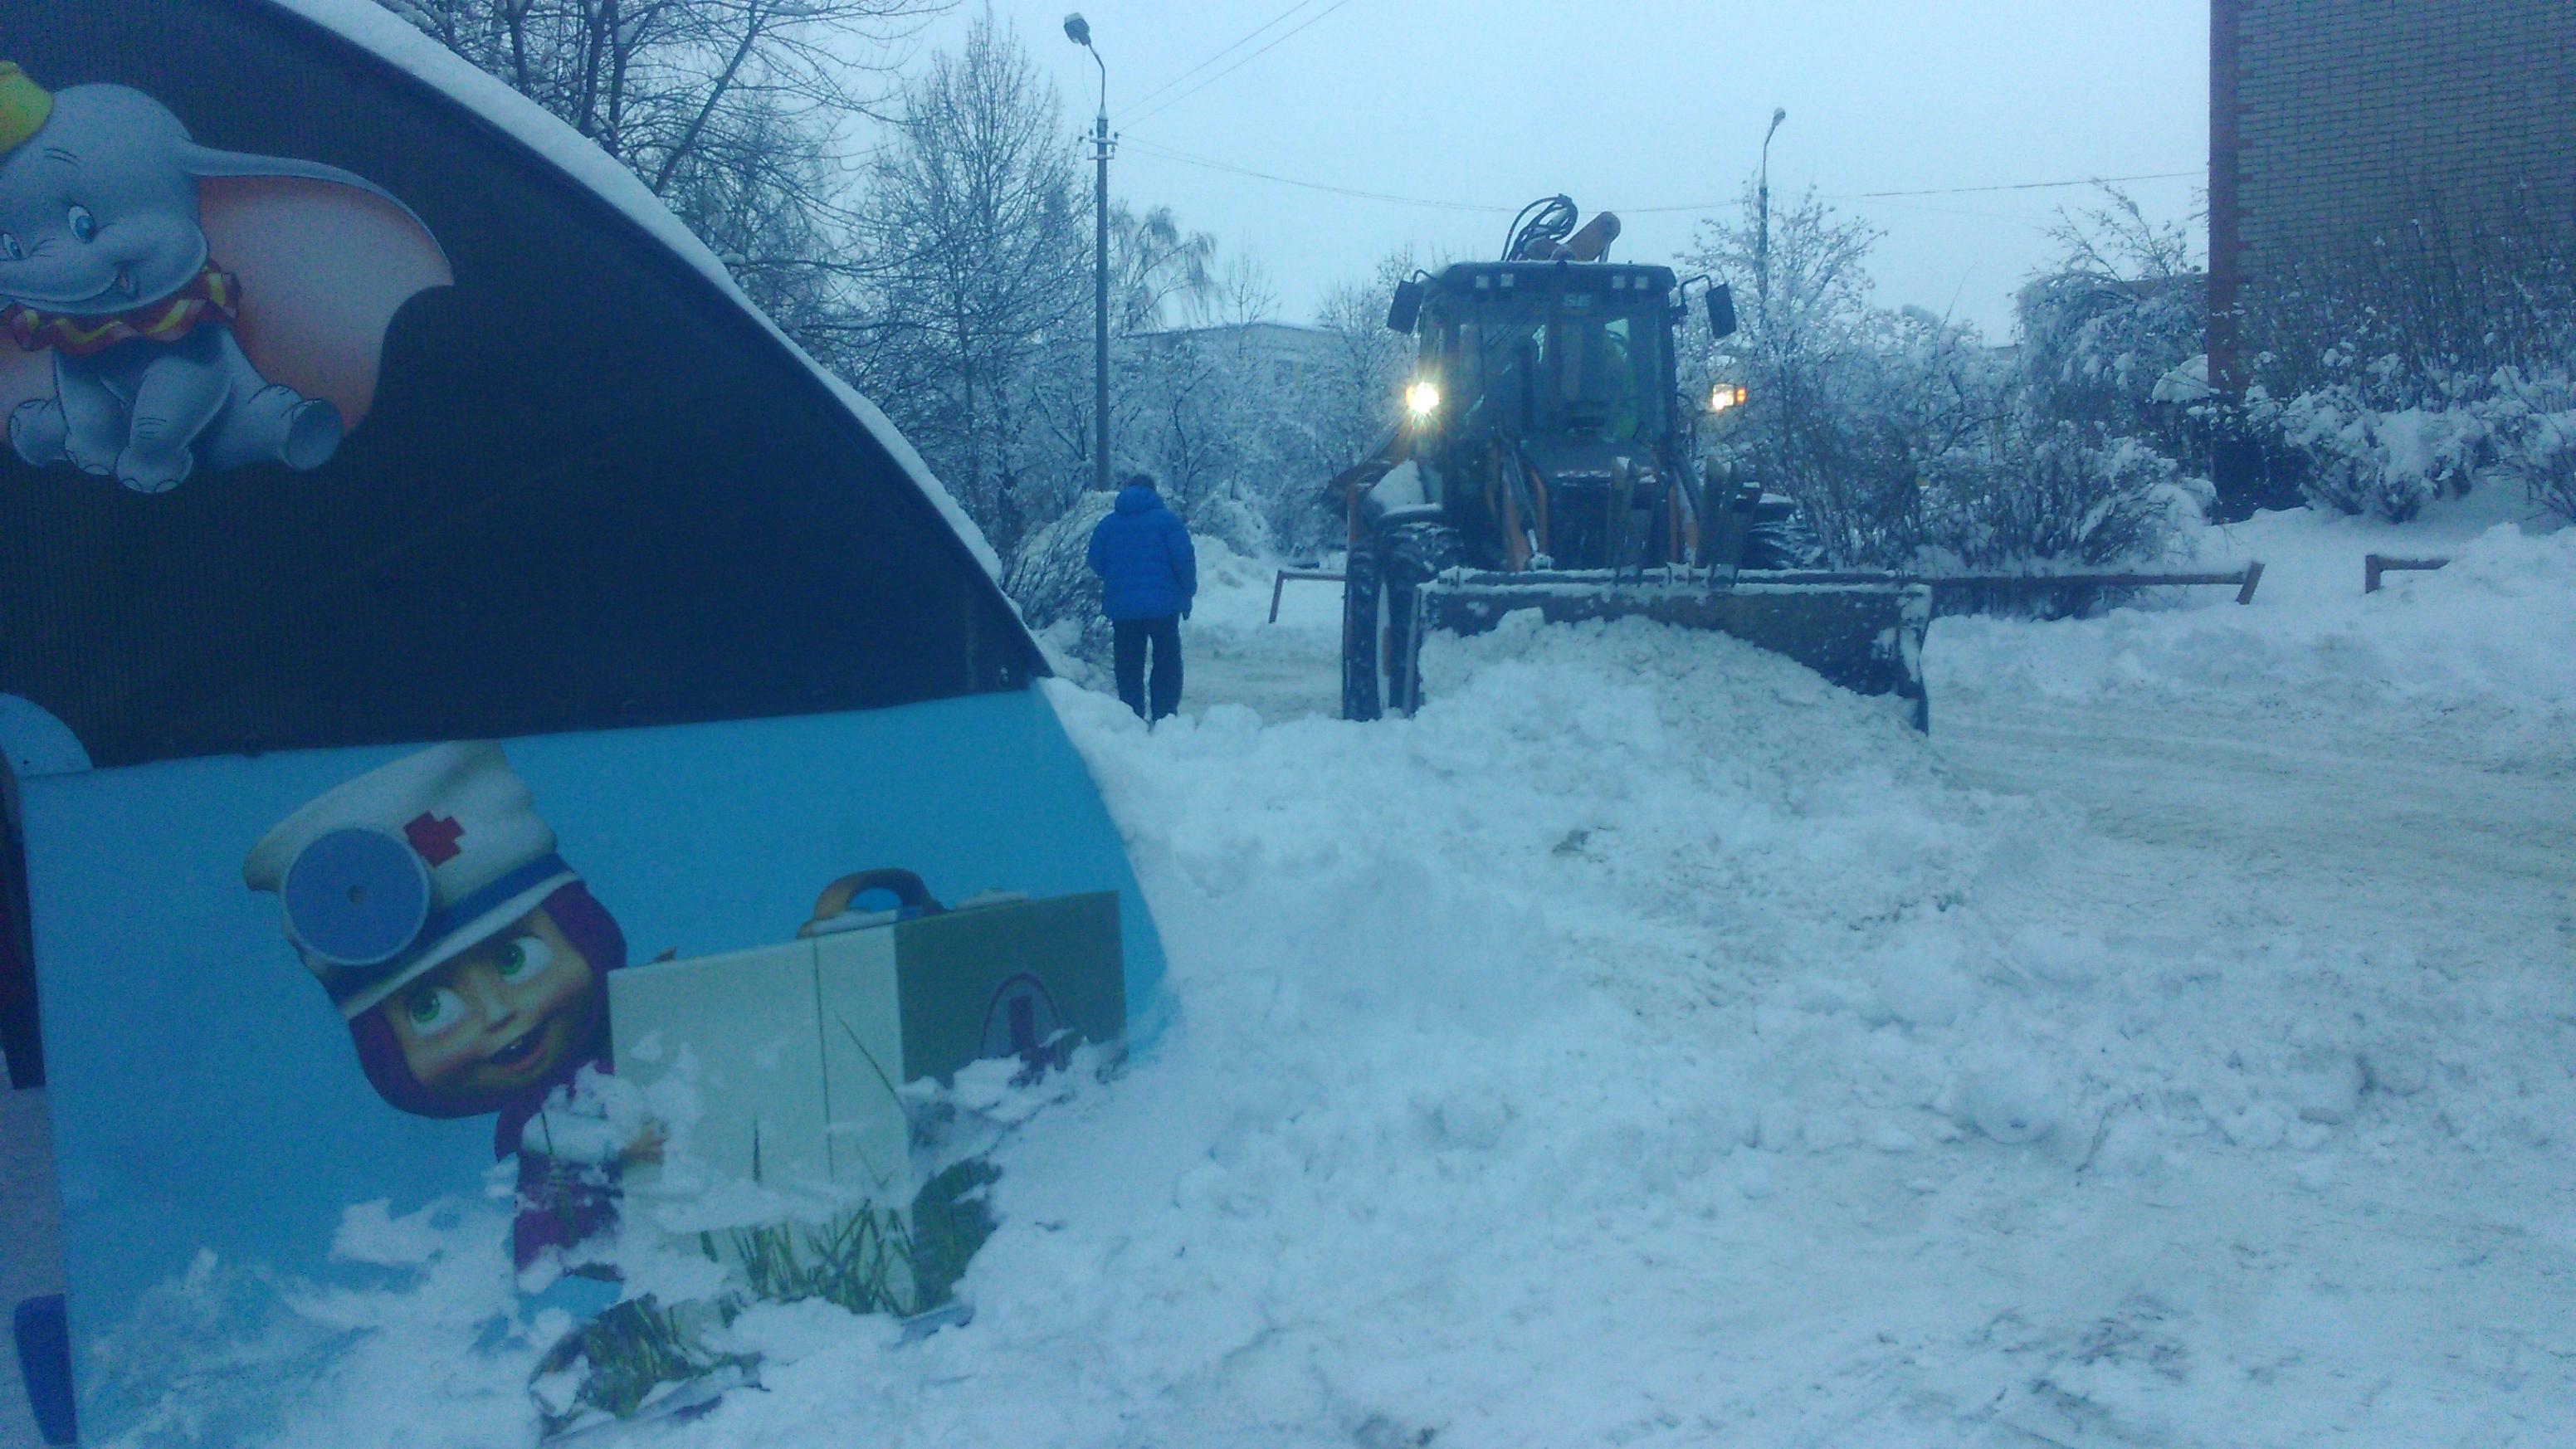 Скрепер-волокуша для уборки снега fiskars snowxpert